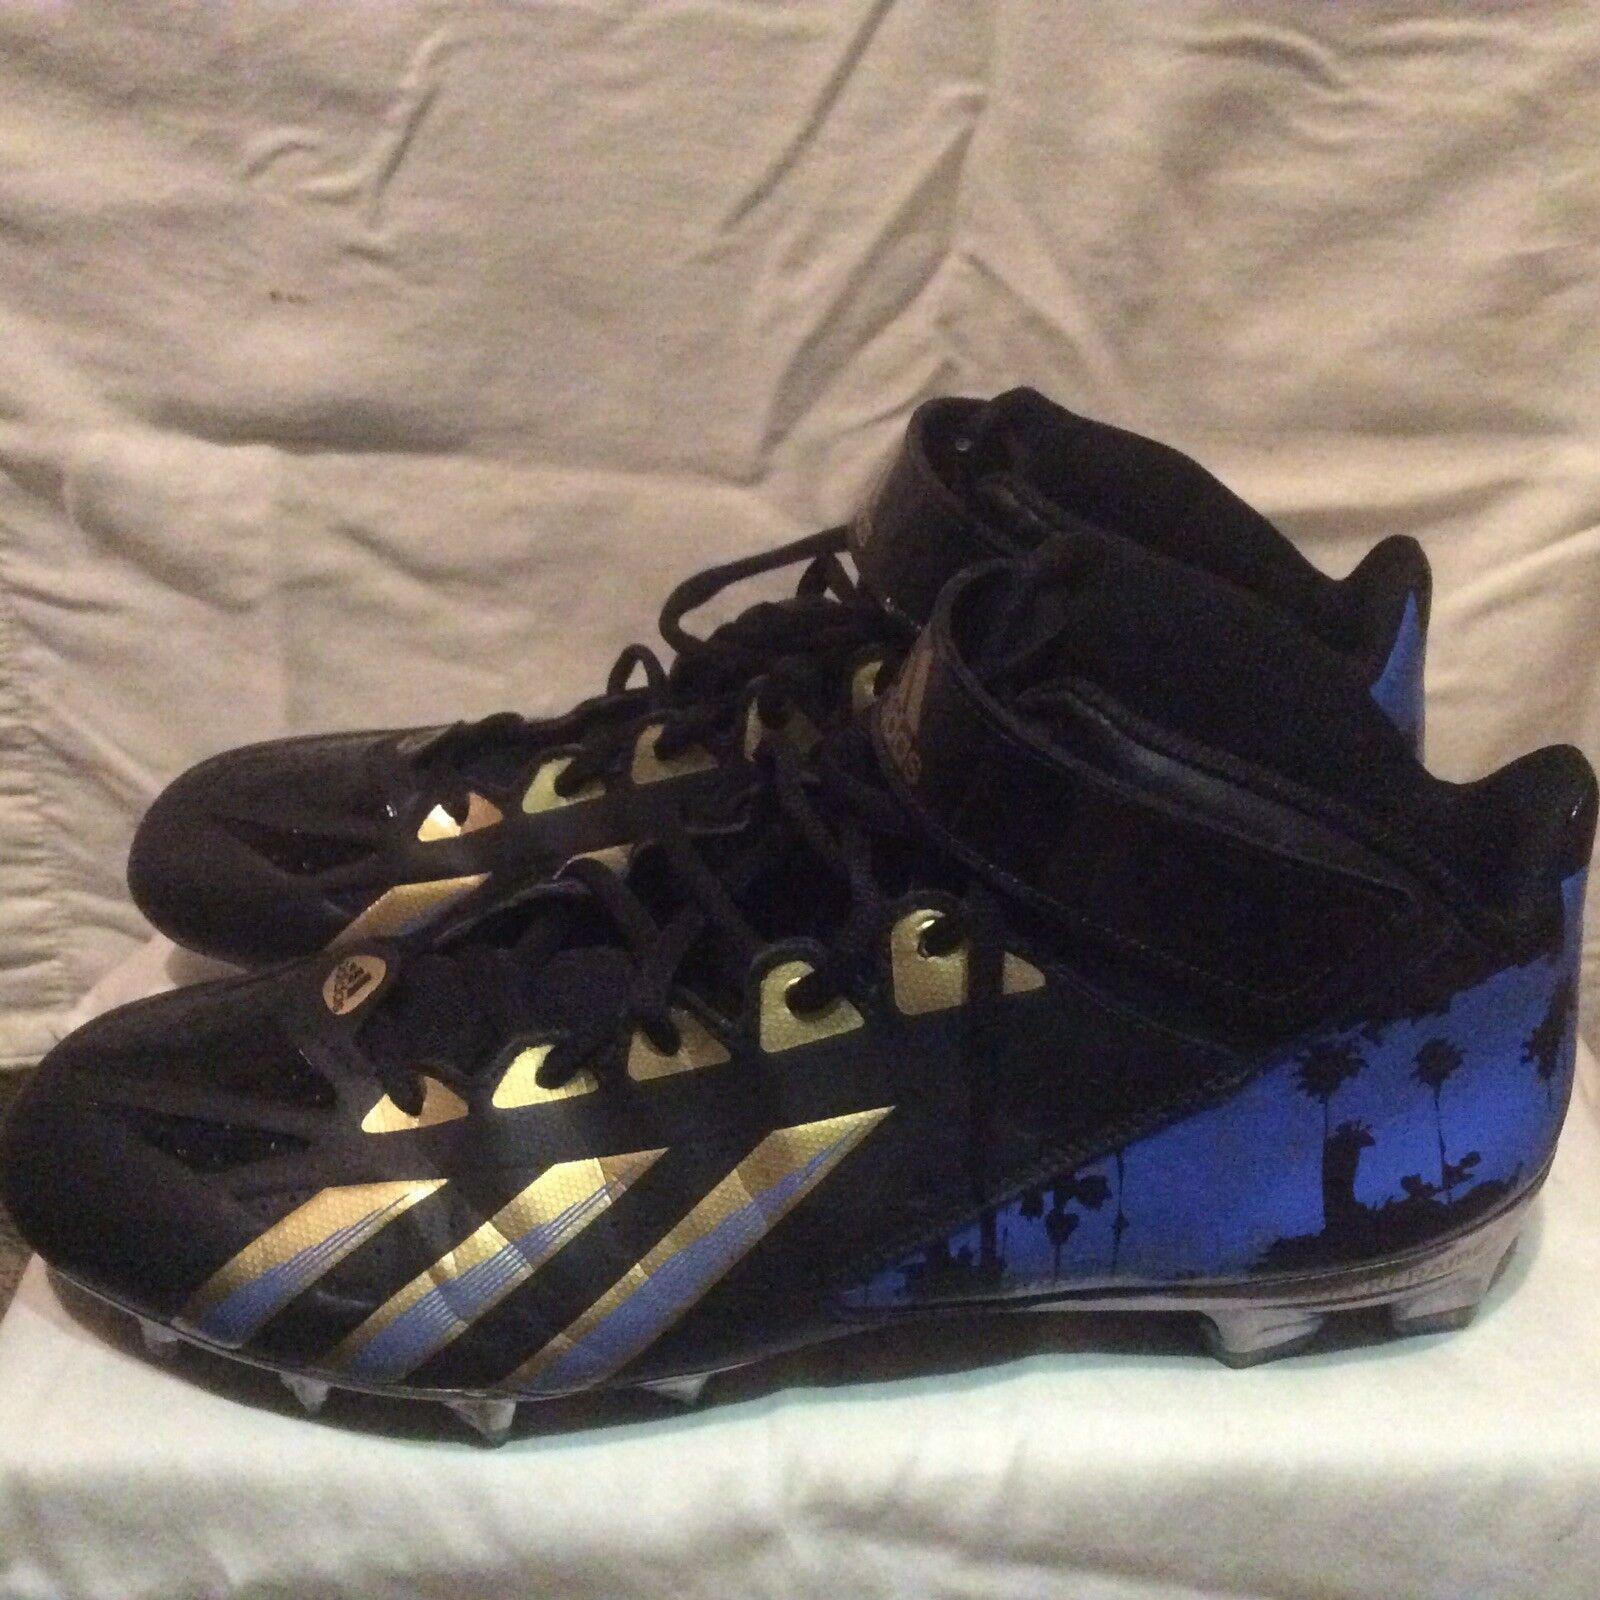 Adidas UCLA Football  LA Nights  2013 Cleats Size 15